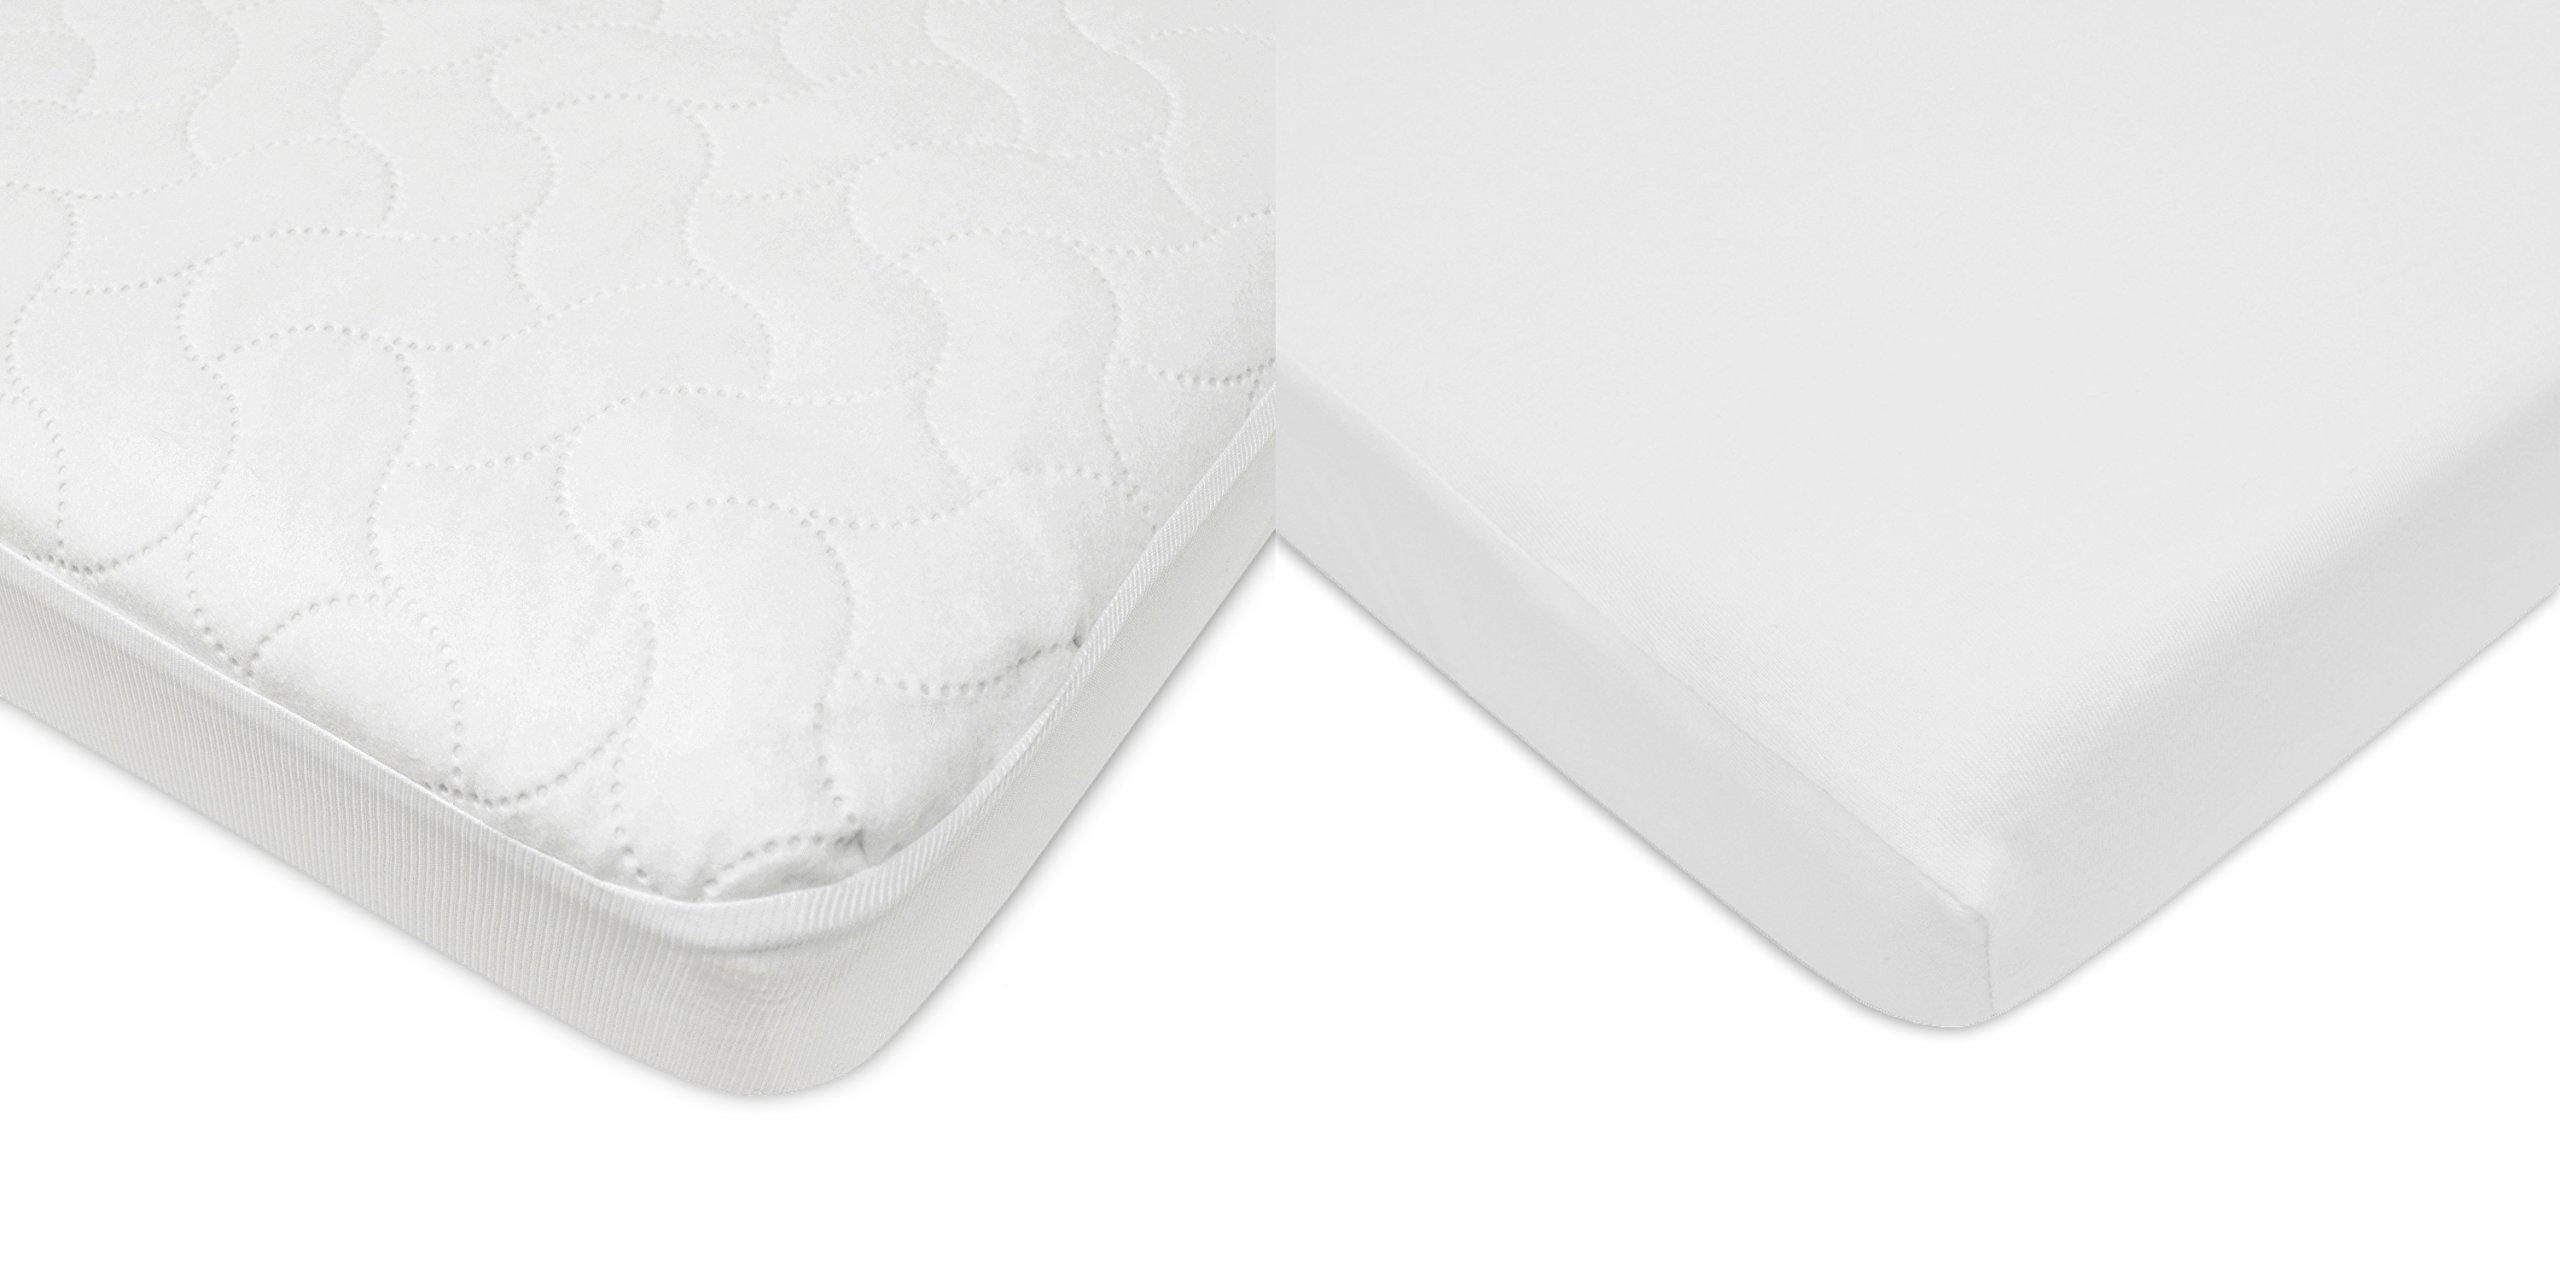 American Baby Company Crib Size Waterproof Mattress Pad Protector and Cotton Jersey Sheet Combo, White